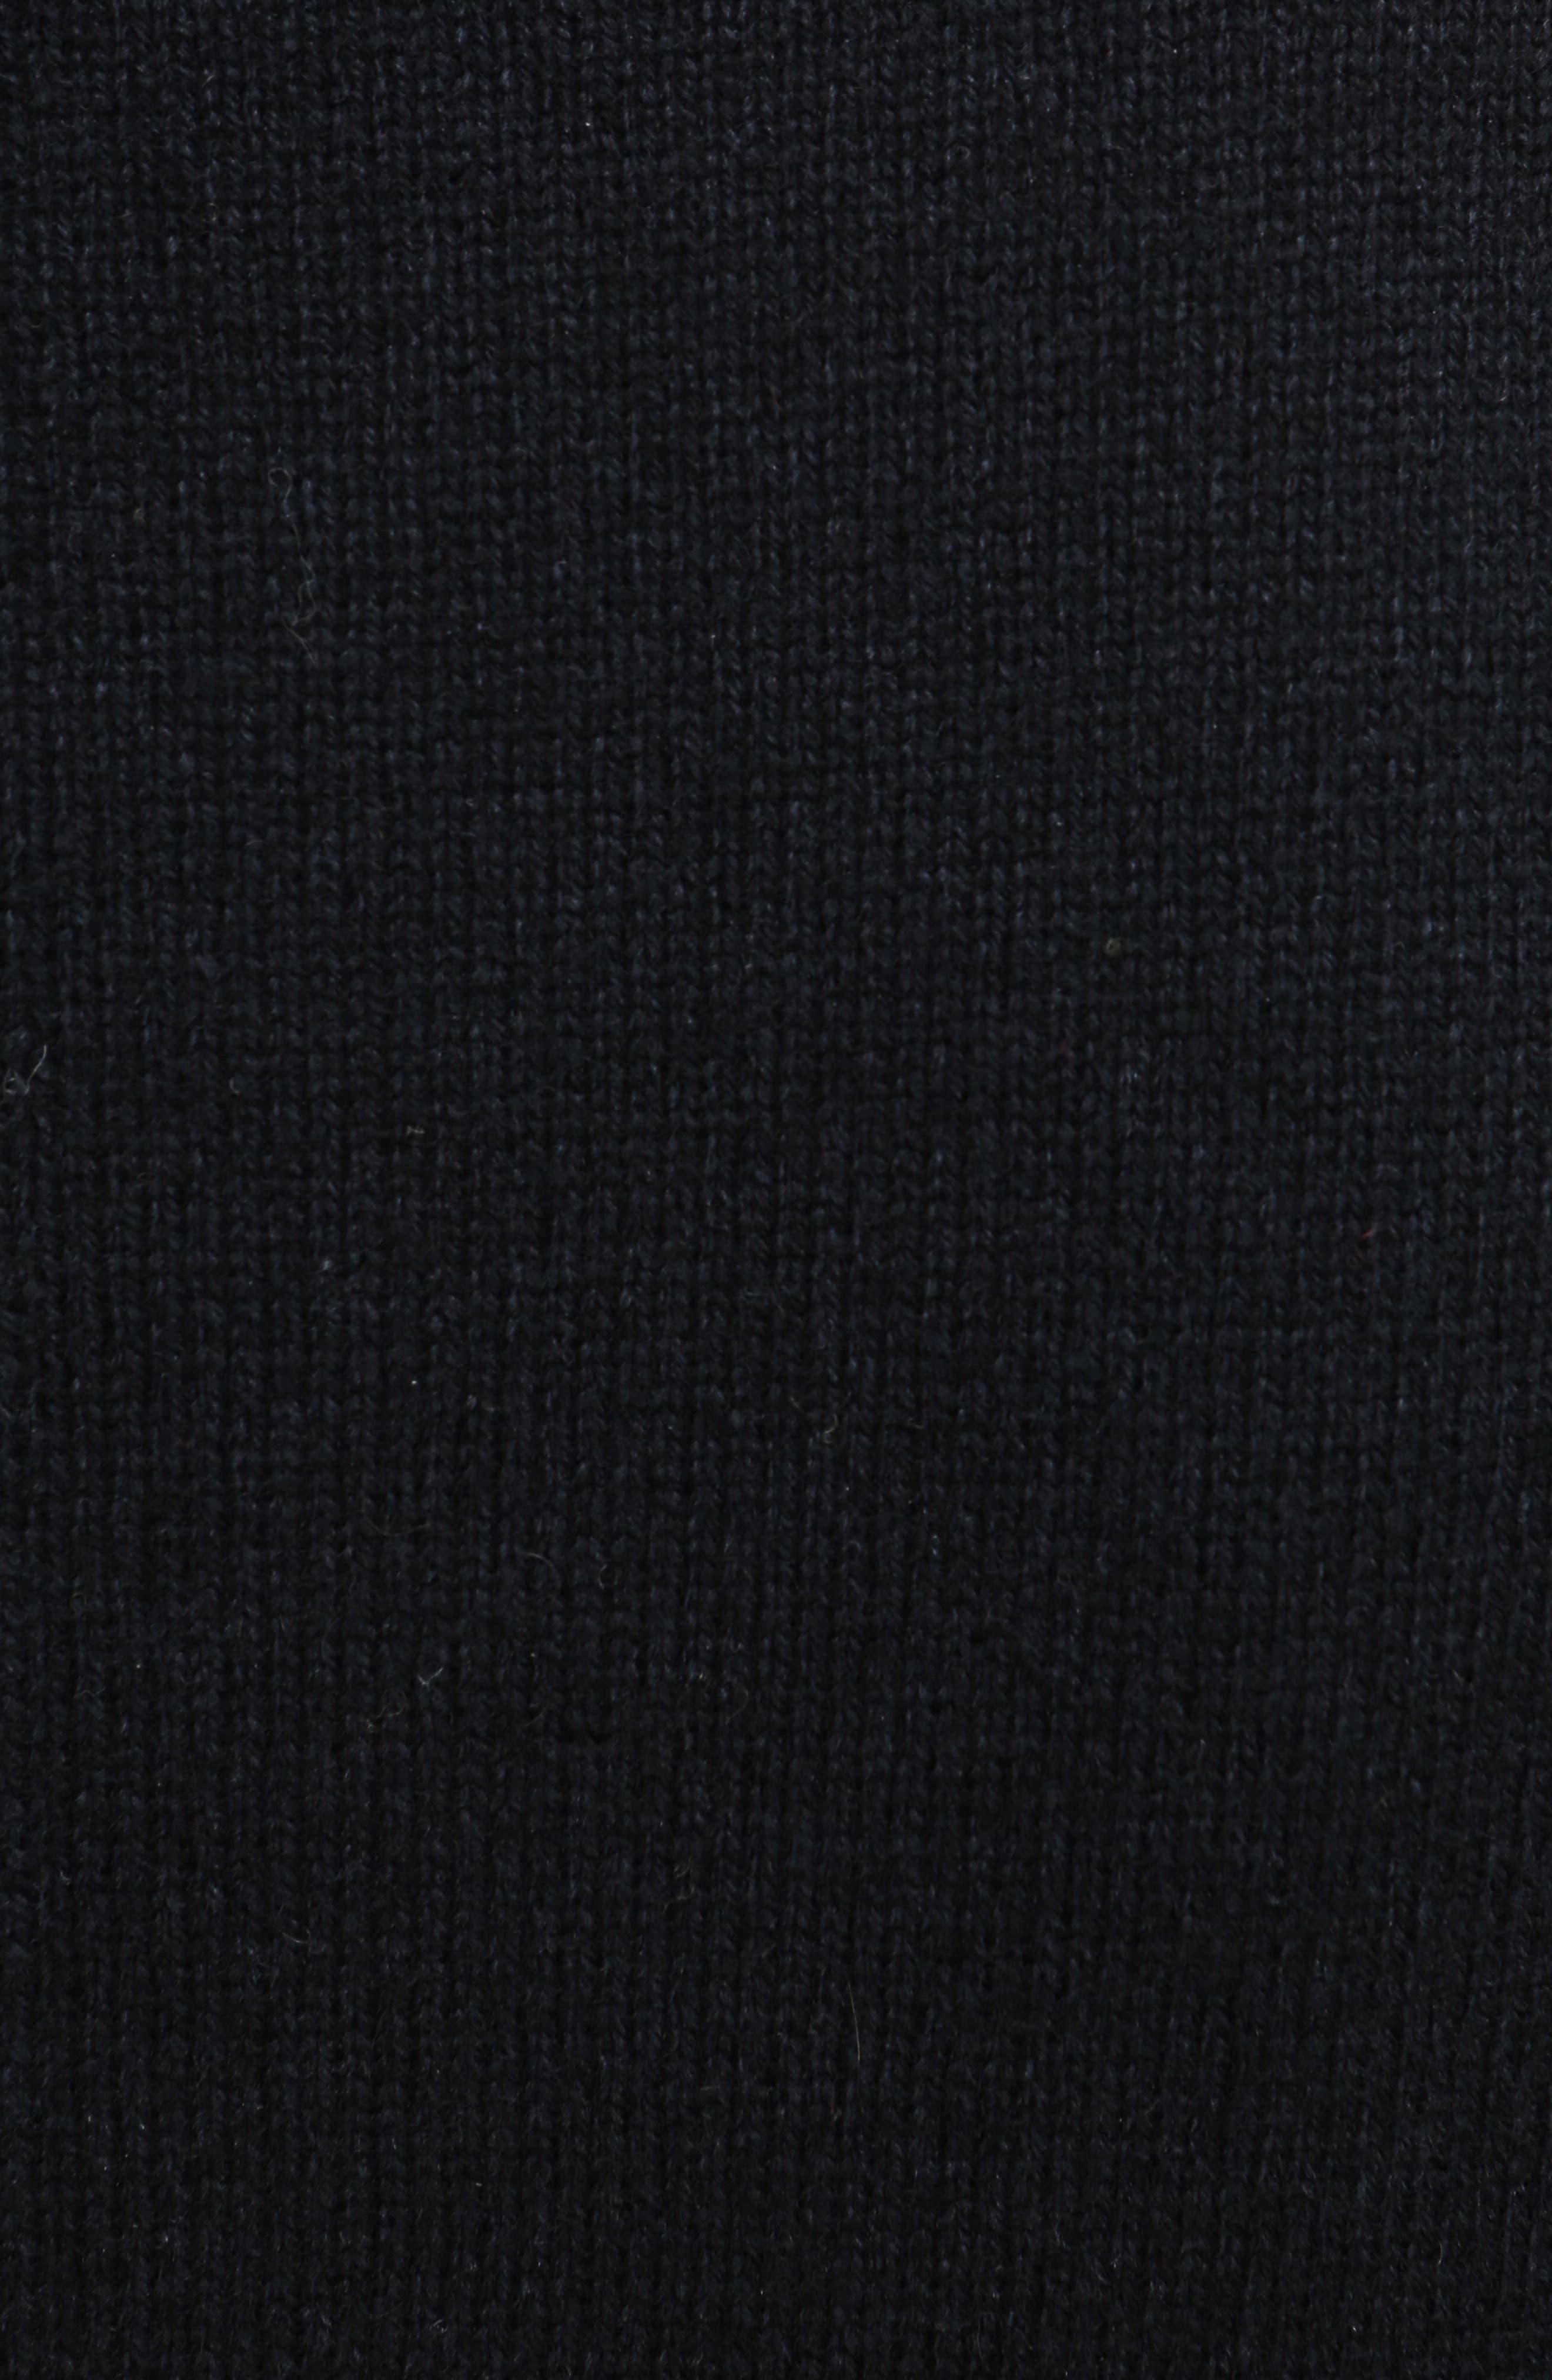 Imitation Pearl Inset Wool Blend Sweater,                             Alternate thumbnail 3, color,                             Black